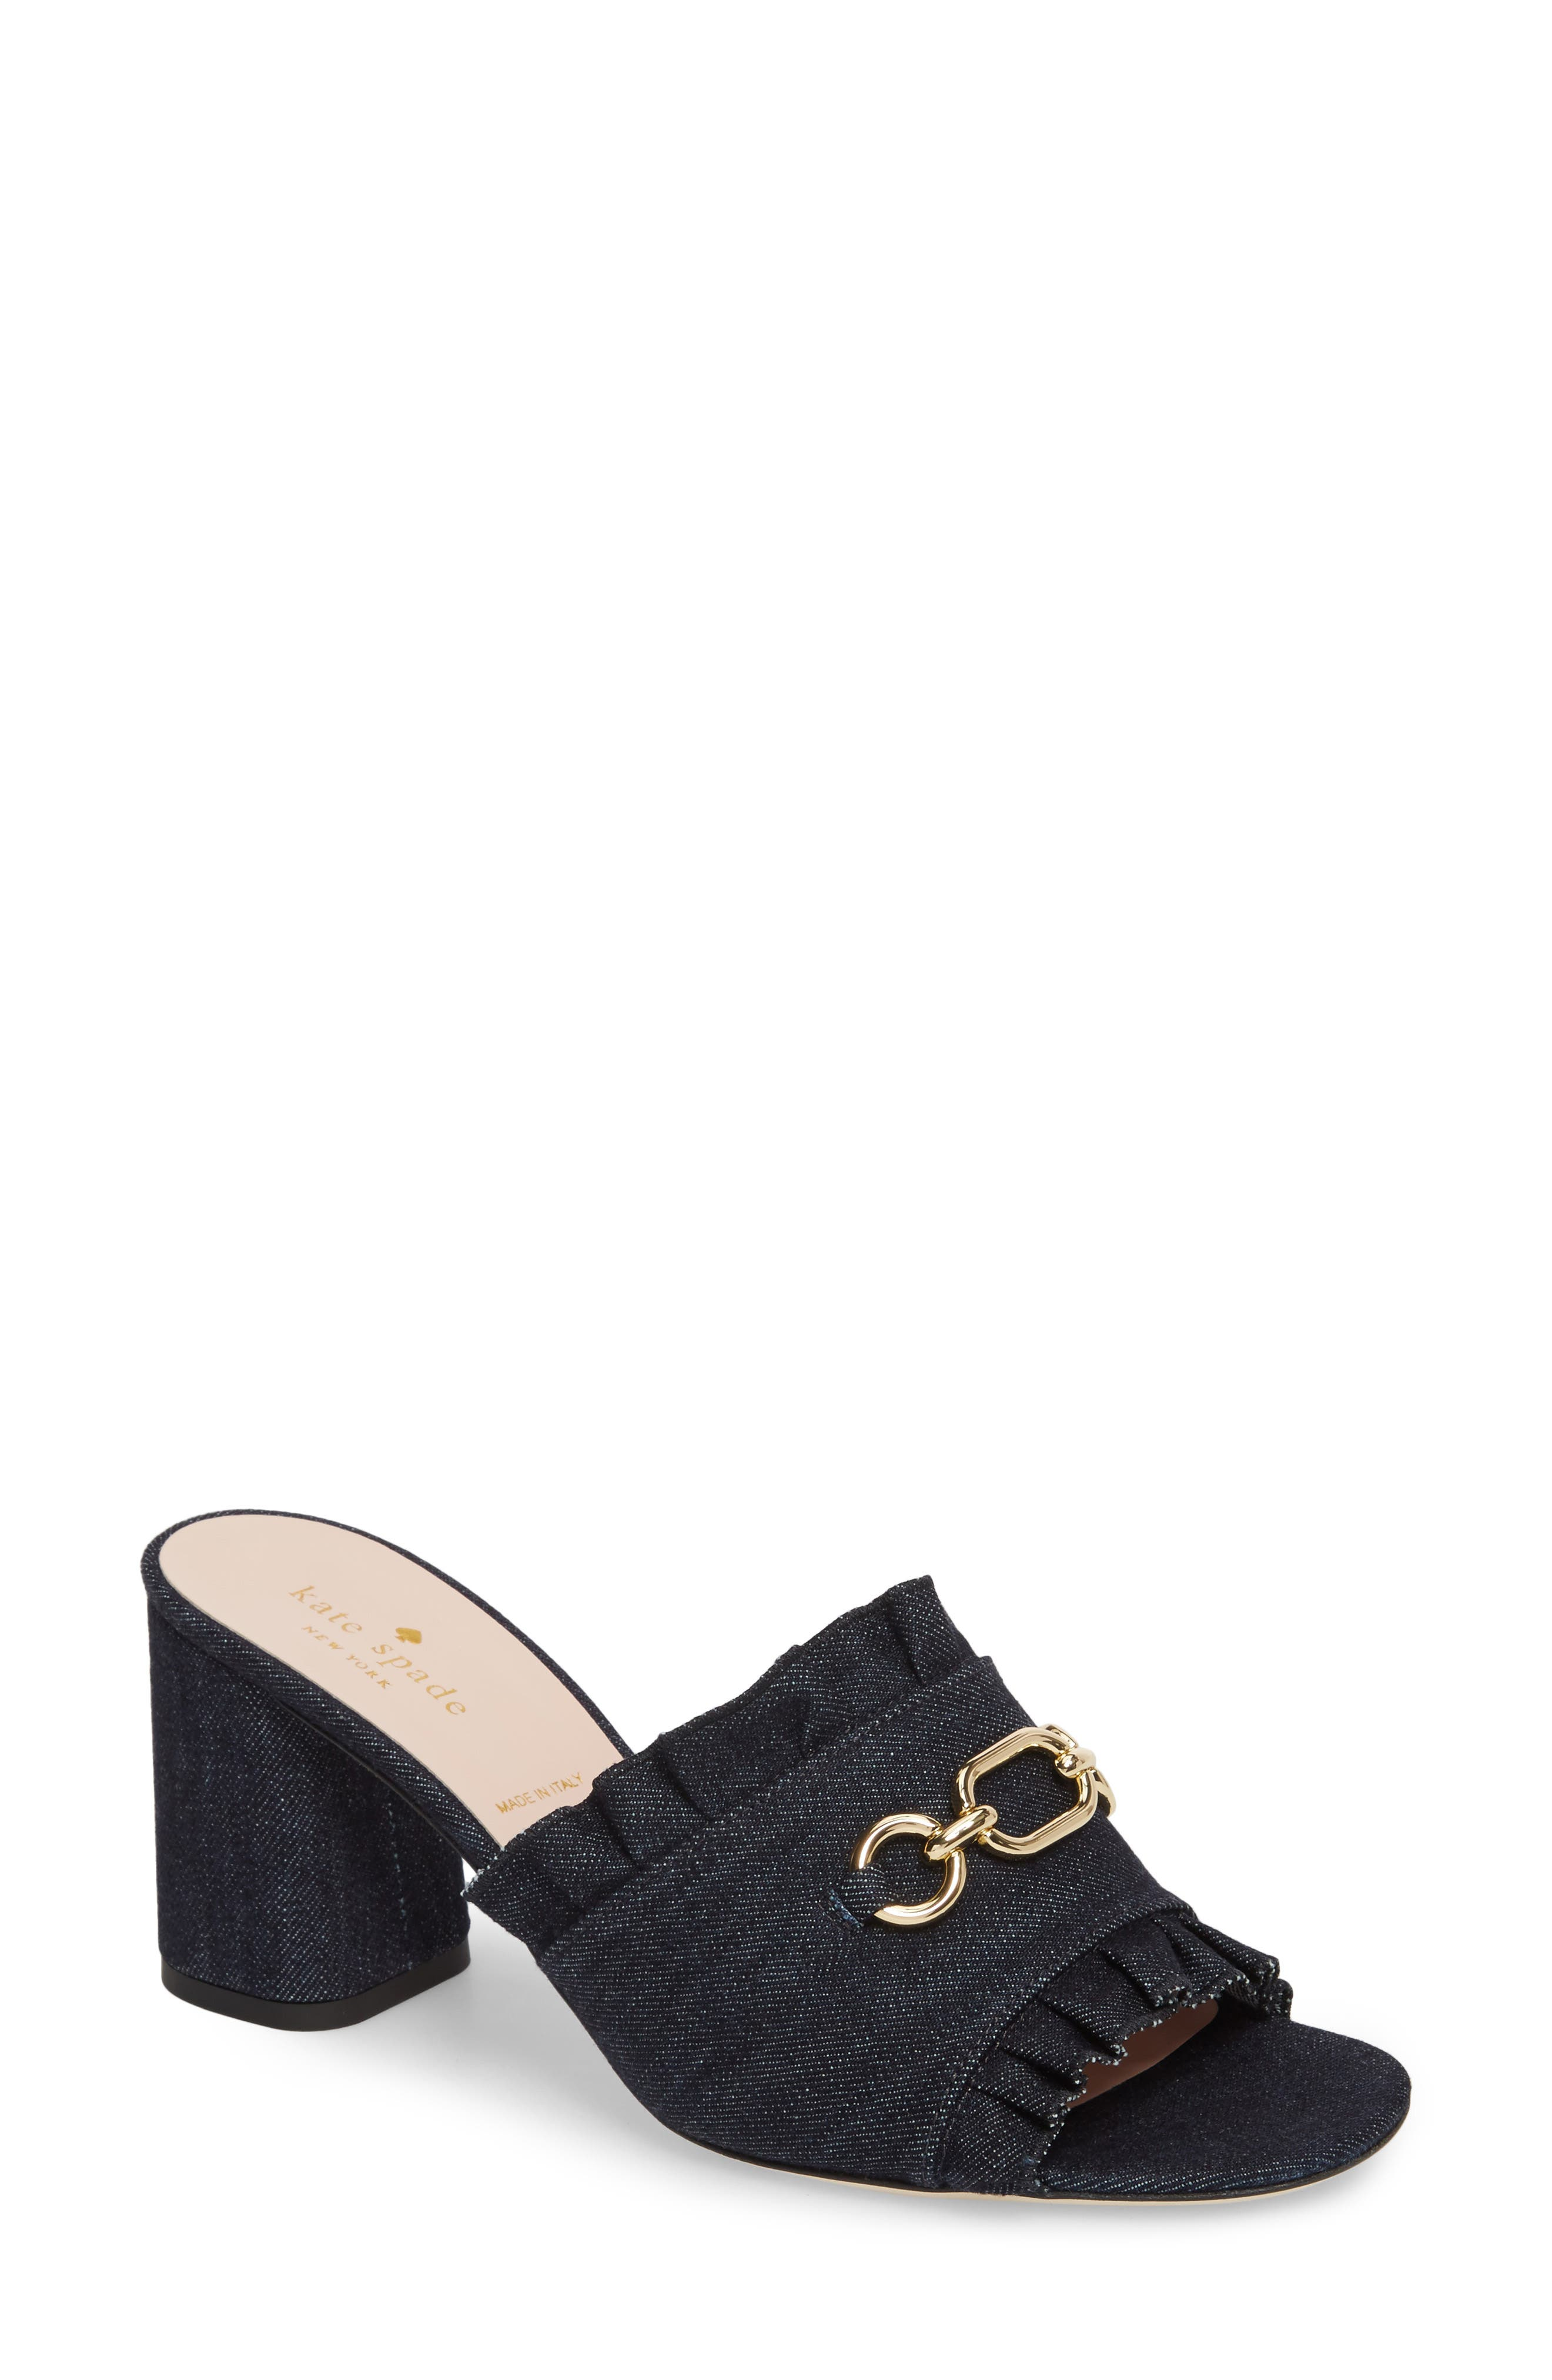 kate spade new york demmi sandal (Women)